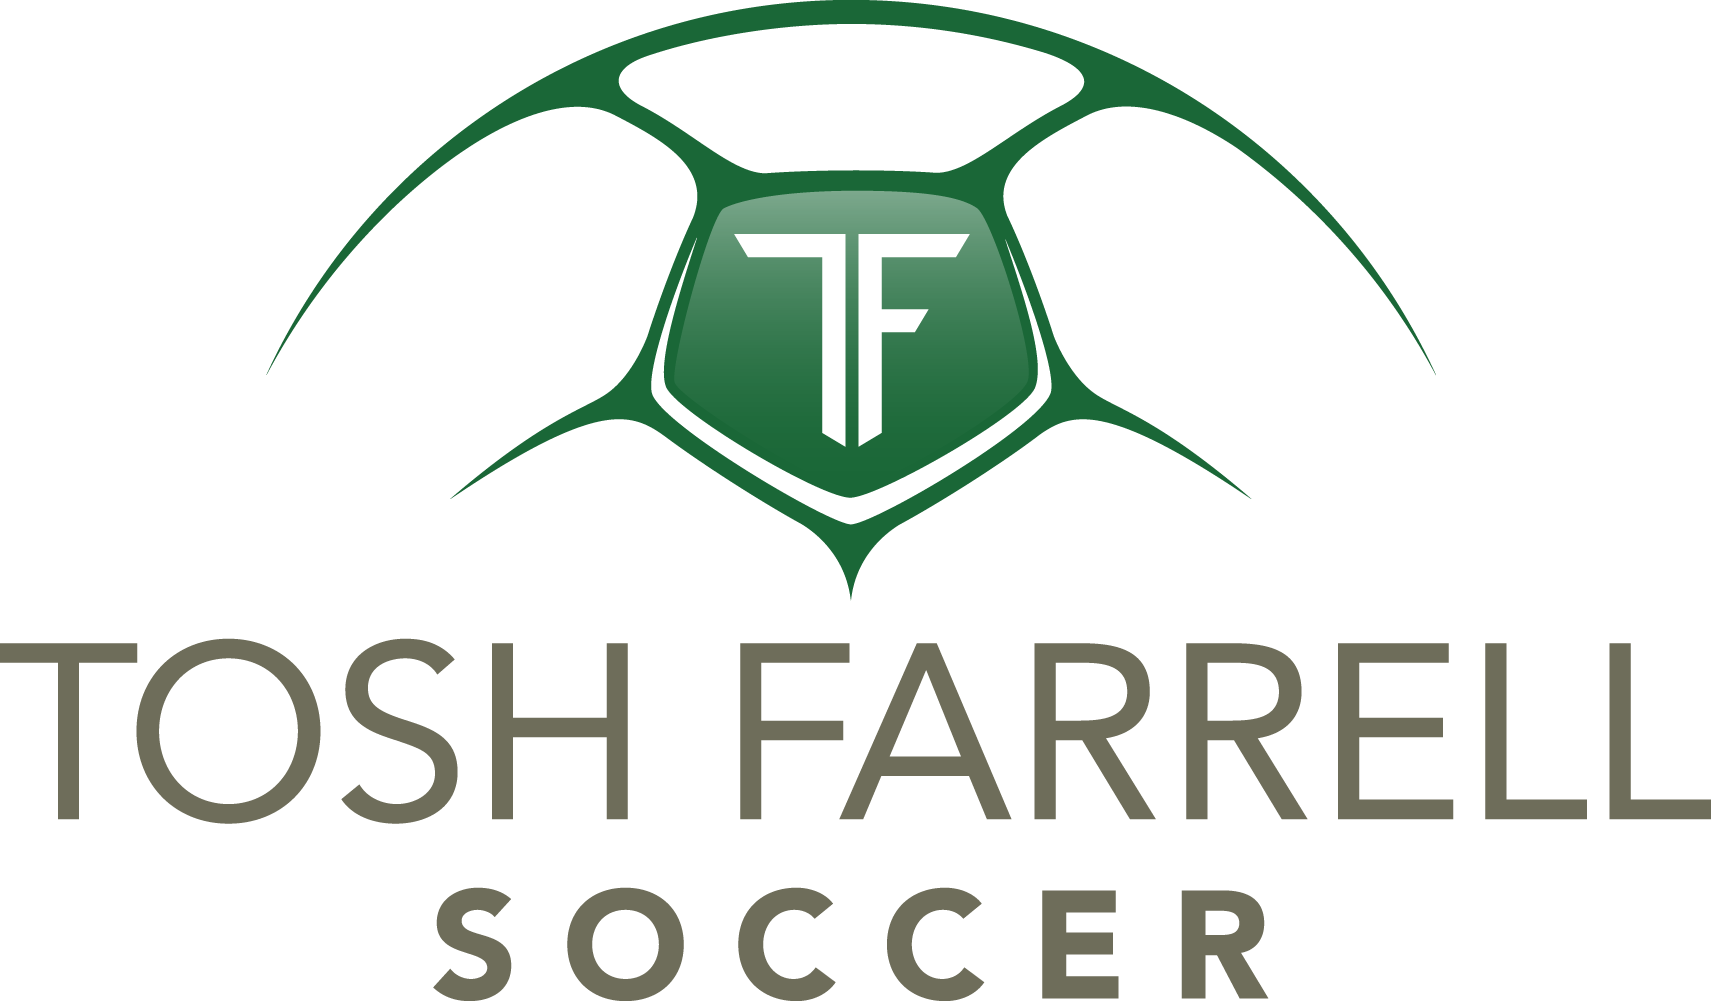 Tosh Farrell Soccer